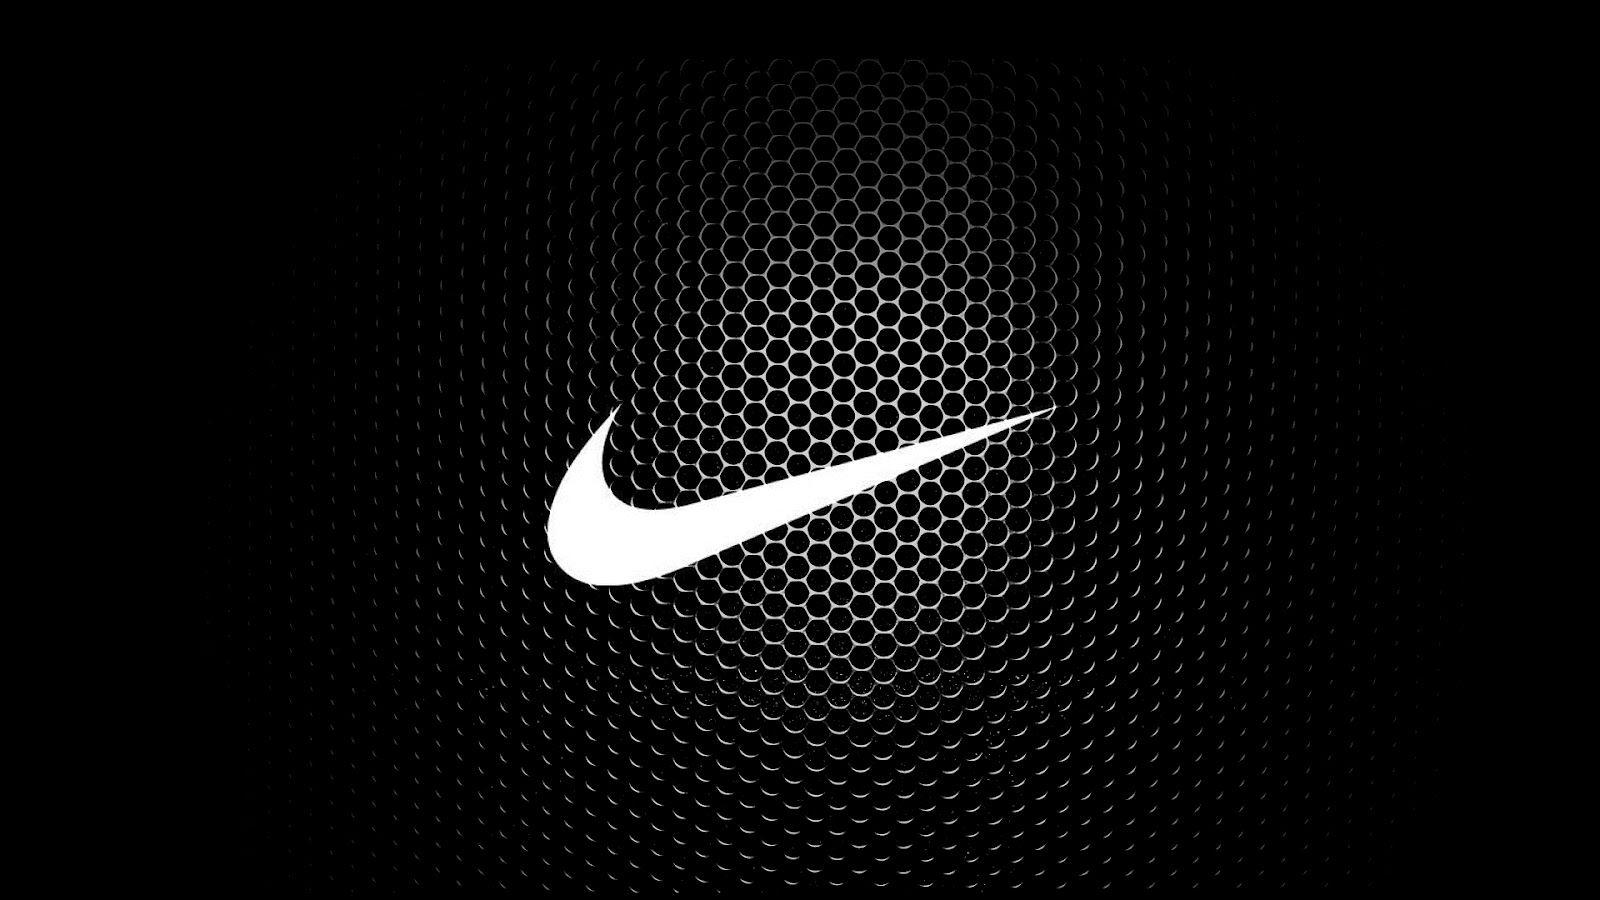 Nike Basketball Wallpaper Hd 1080p Nike Logo HD 1080p Wal...